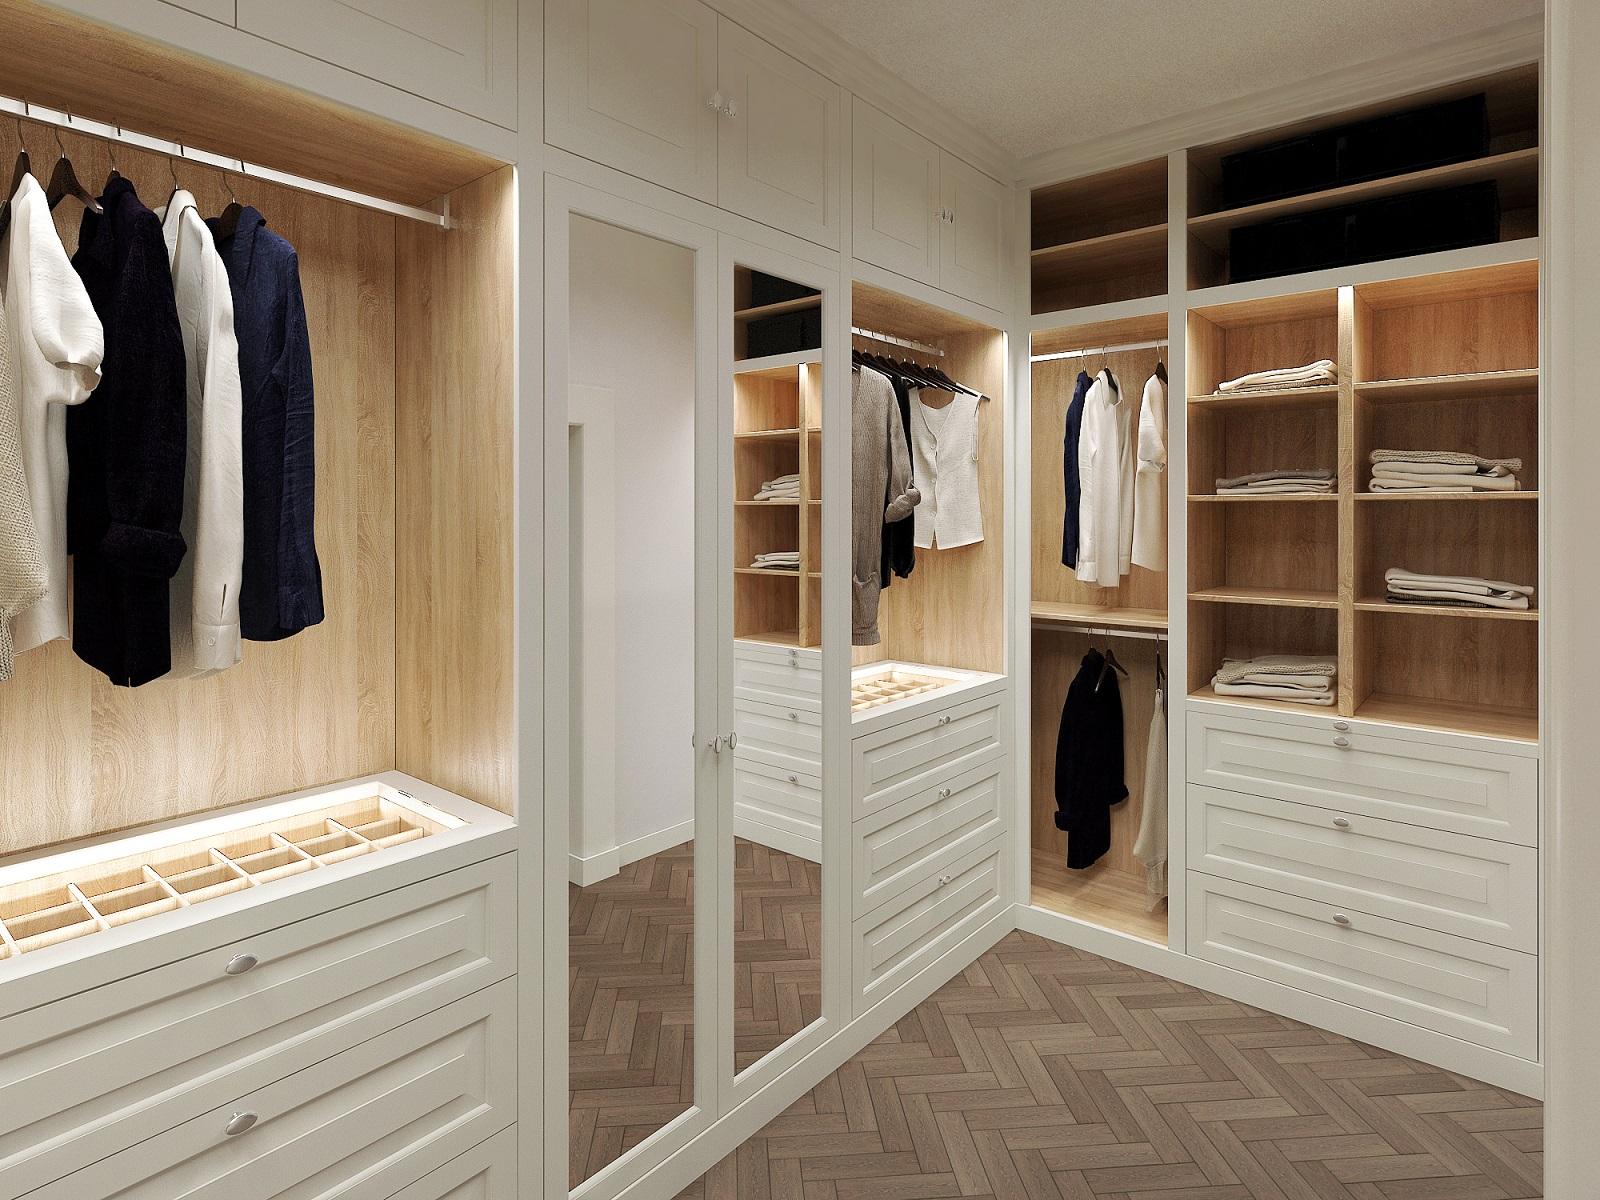 Wardrobes Walkin Closet Designed Cabinets Amsterdam